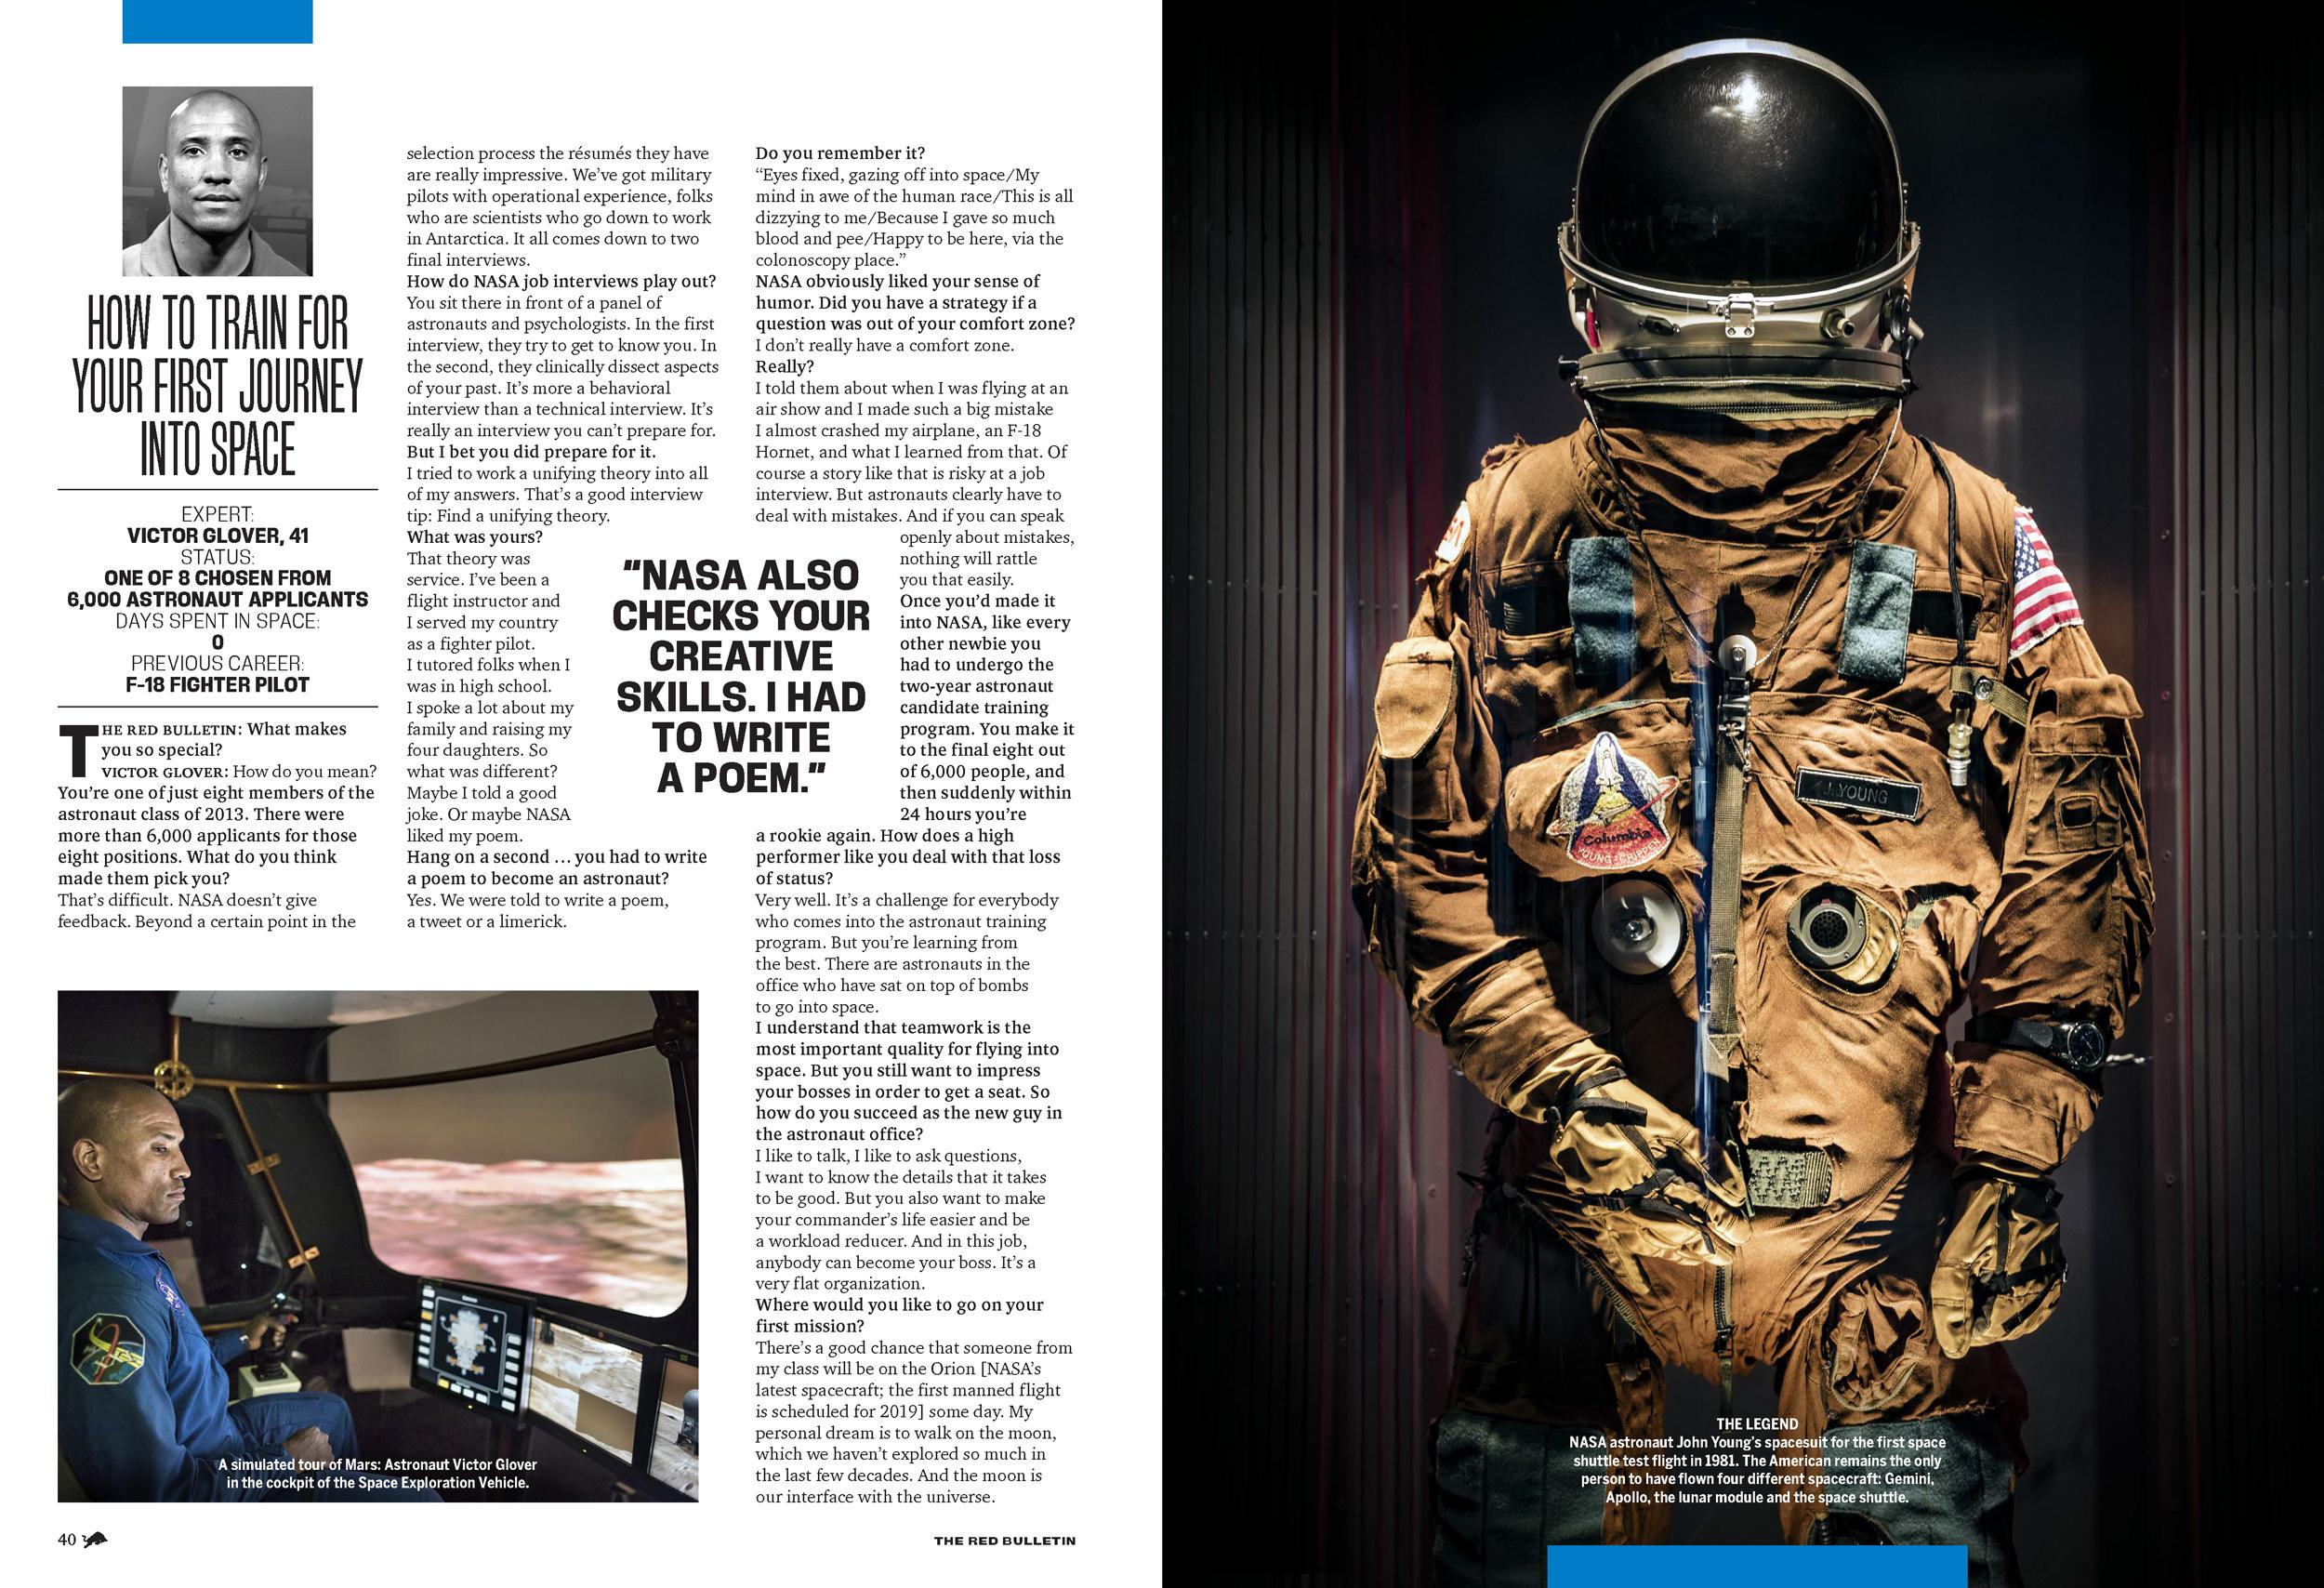 Justin_Bastien_Red_Bulletin_21070601_NASA_Feature_Page_6.jpg